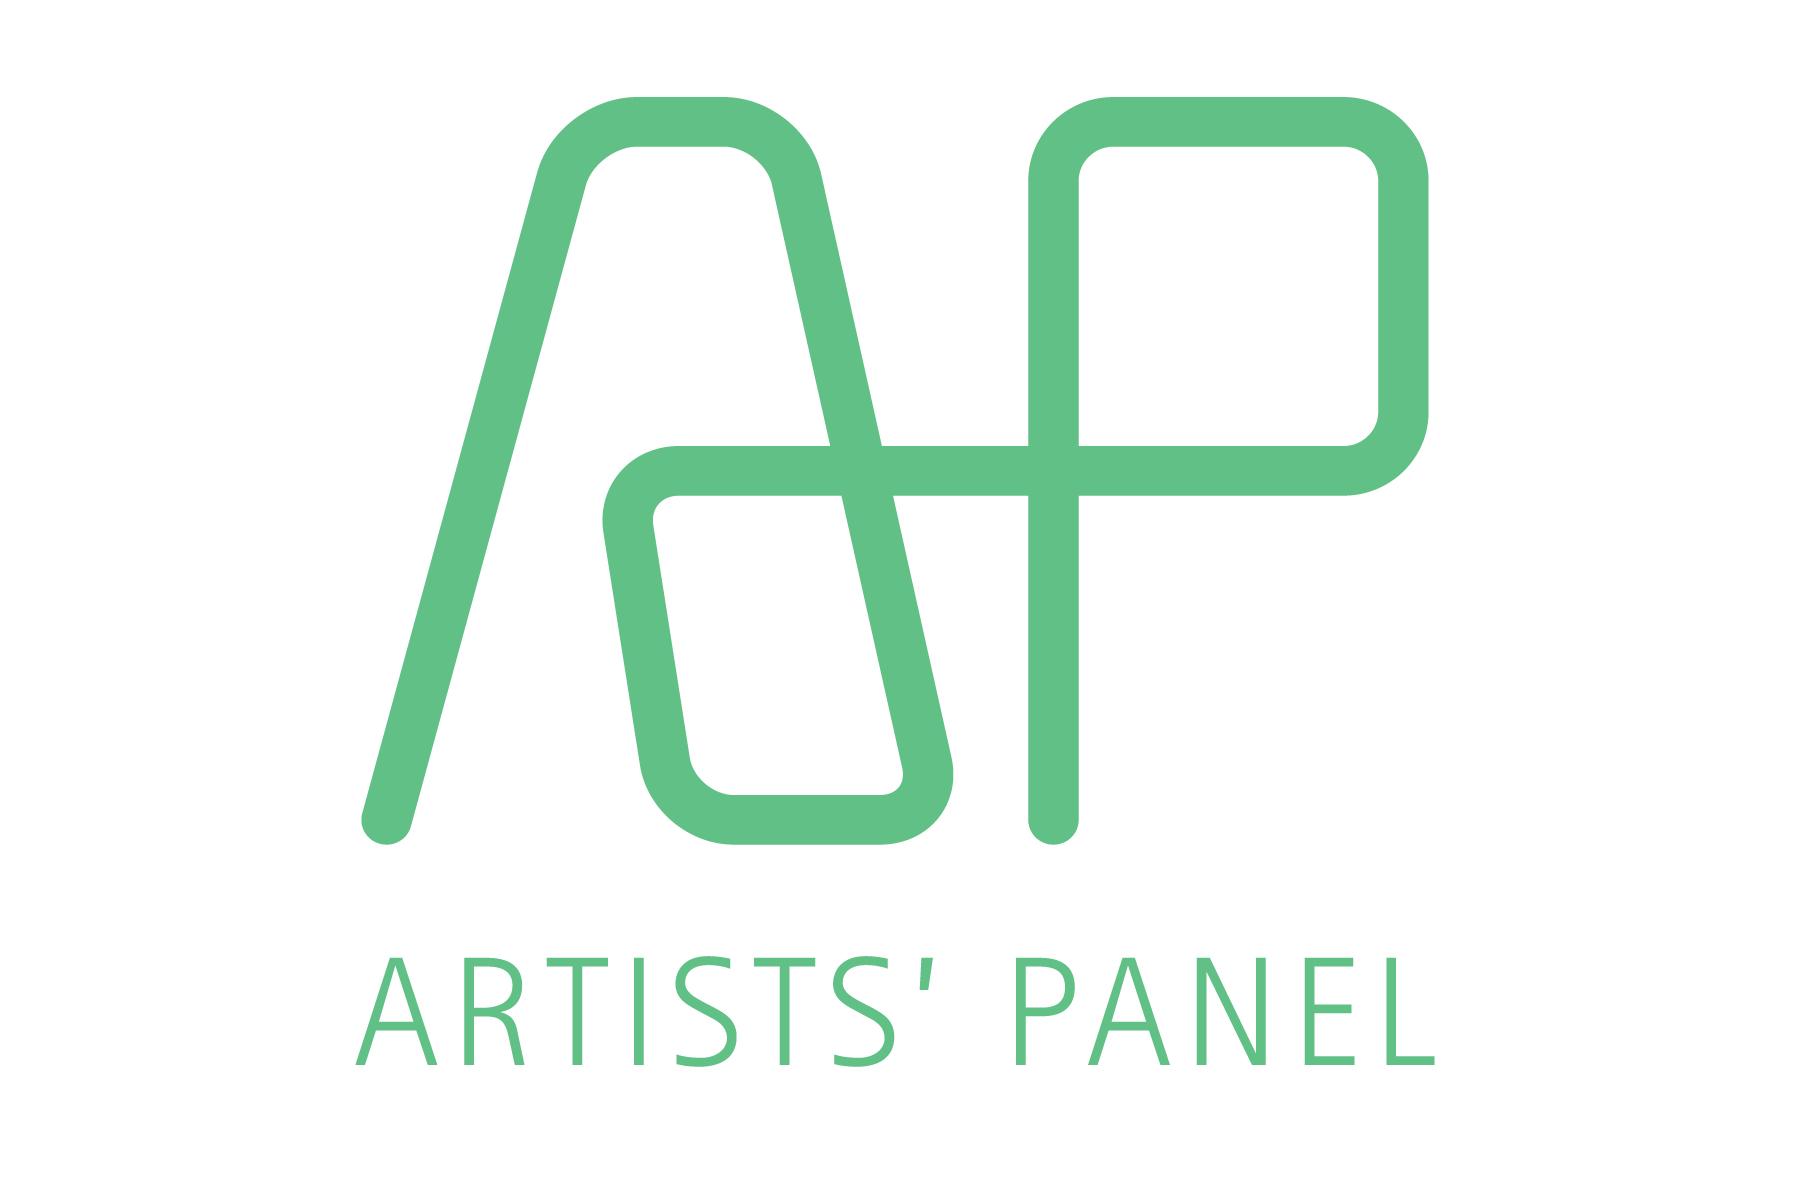 Cover image: Artists' Panel Branding